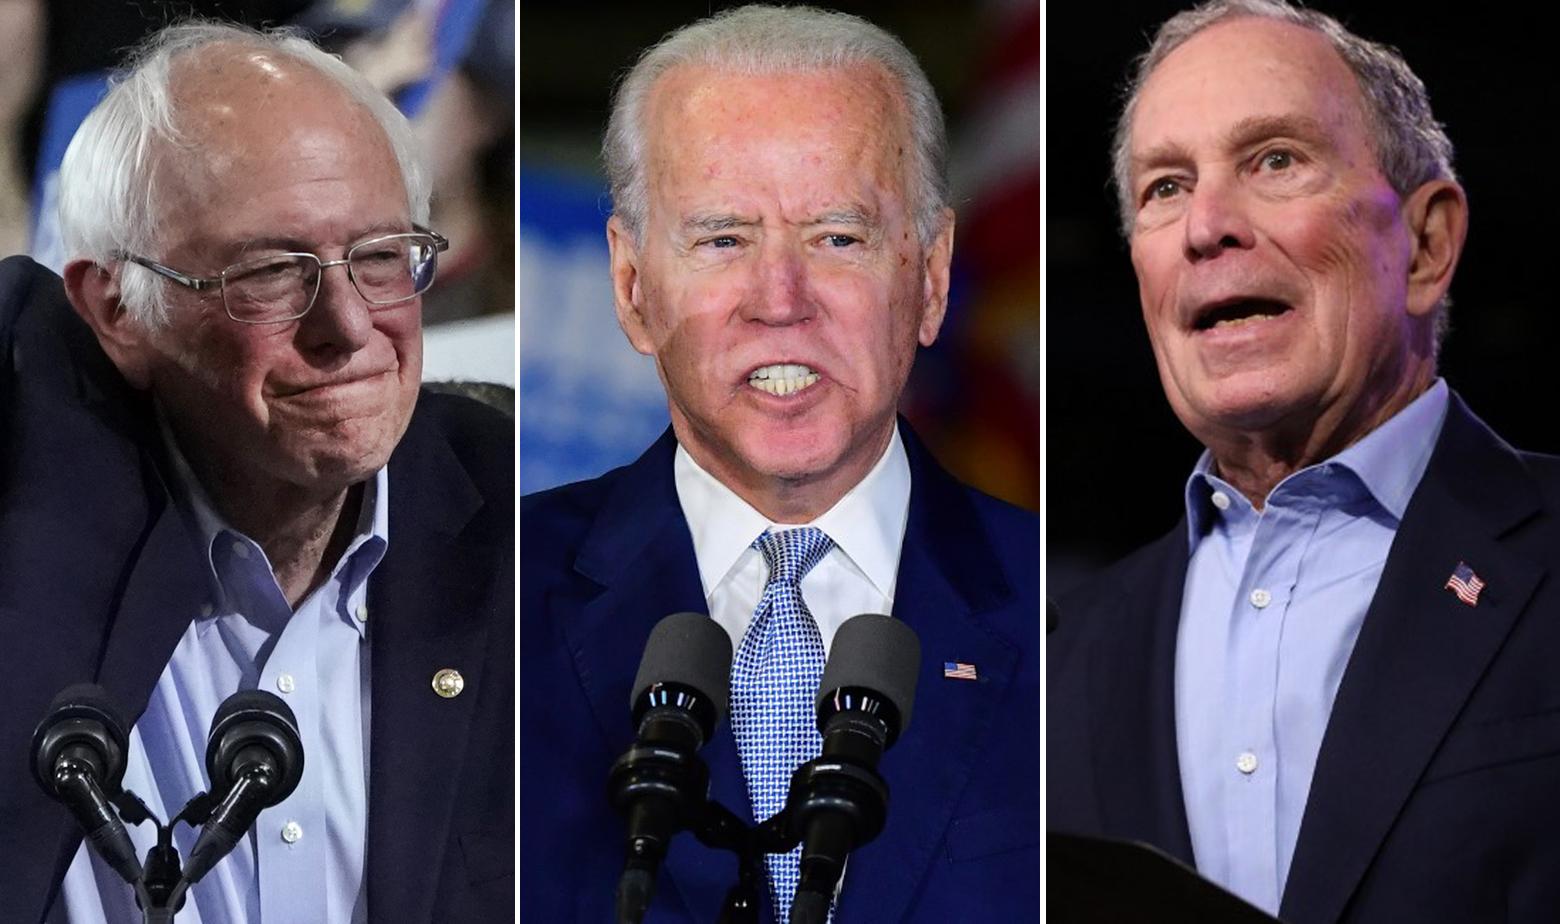 Bernie Sanders, Joe Biden, Michael Bloomberg